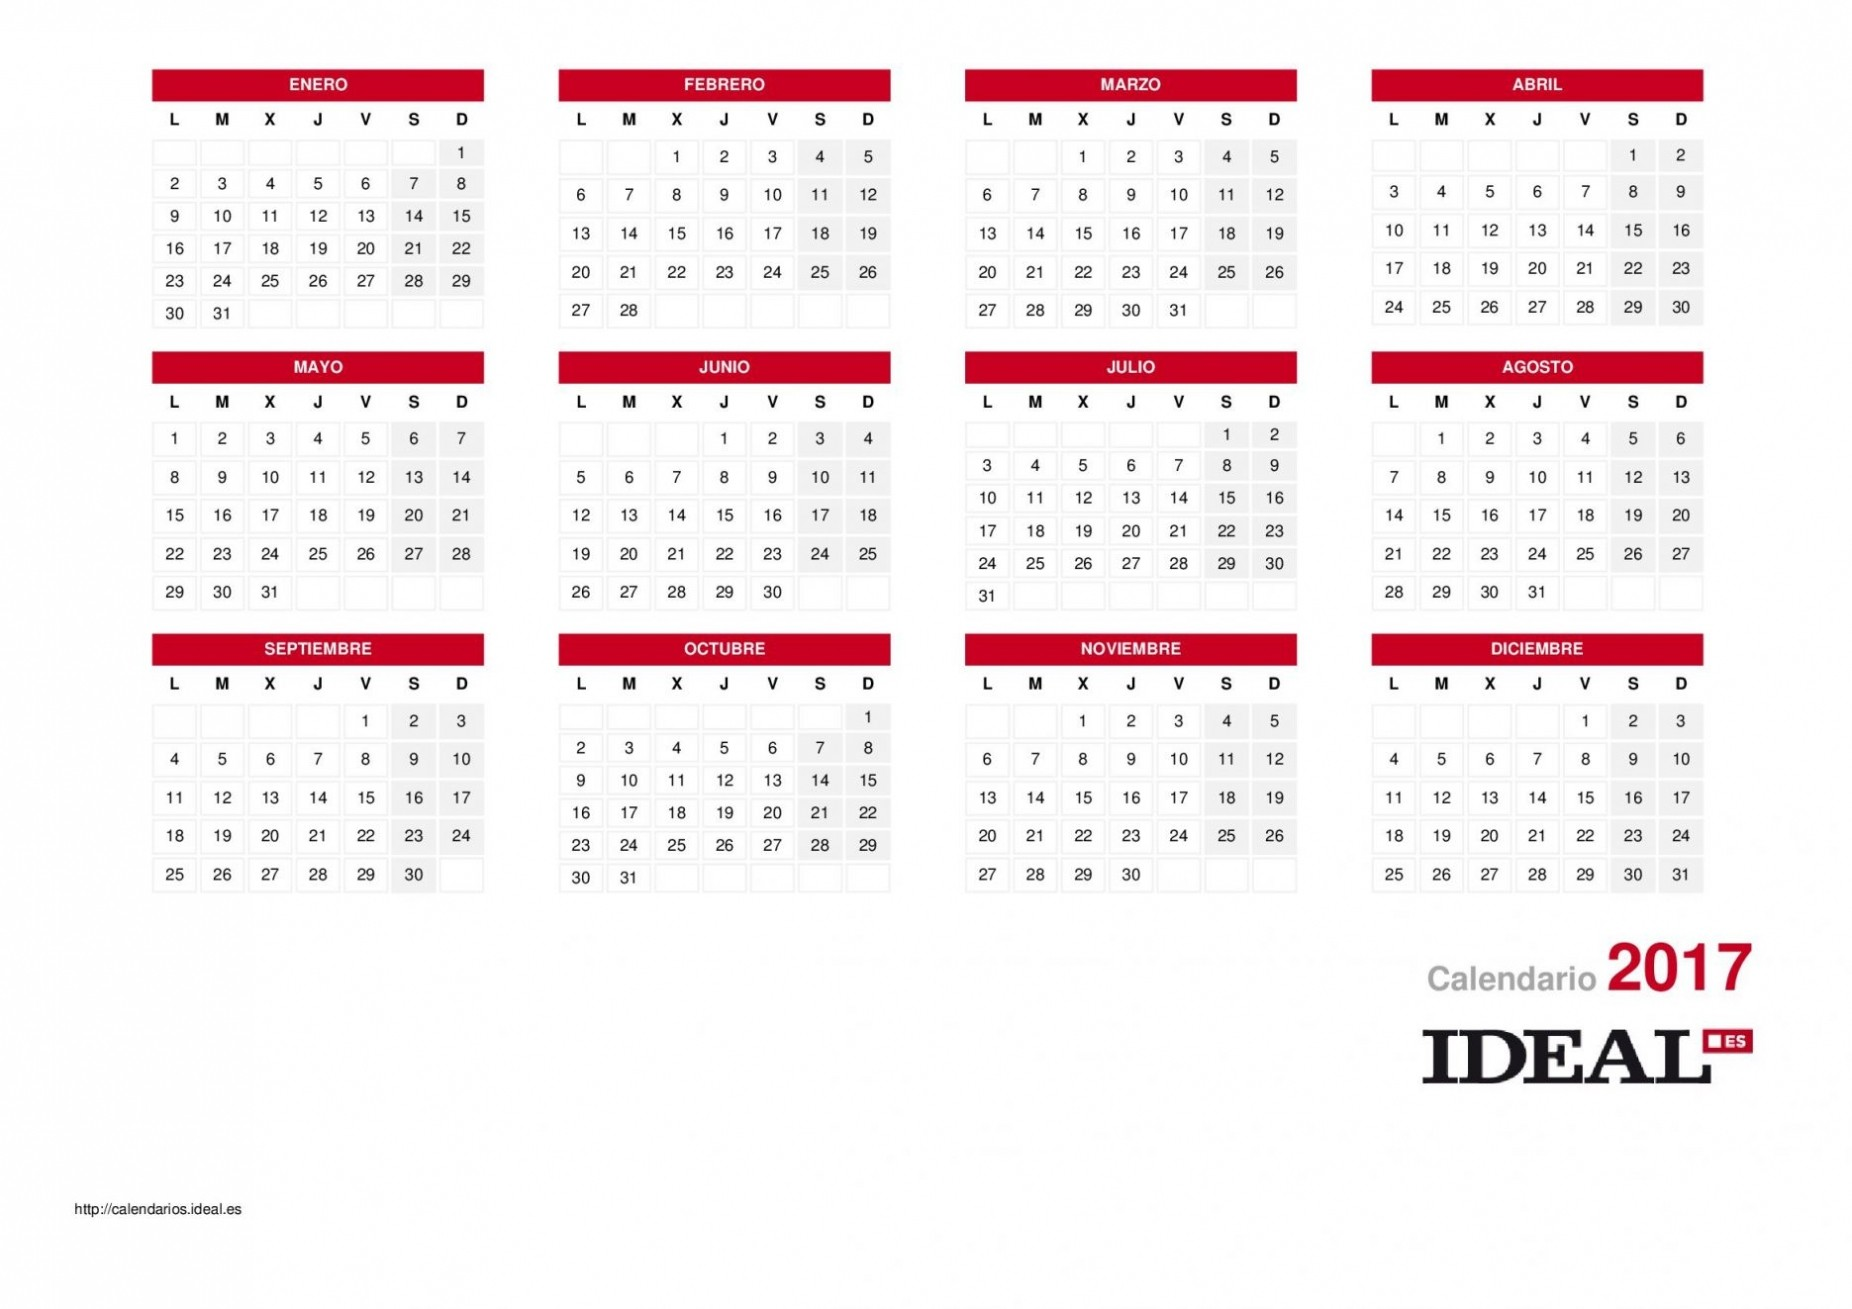 Calendario De Febrero 2018 Con Festivos Colombia Más Caliente Greatest Calendario Colombia Con Festivos 2017 Qc75 – Documentaries Of Calendario De Febrero 2018 Con Festivos Colombia Recientes Best Calendario Octubre 2017 Con Festivos Para Imprimir Image Collection